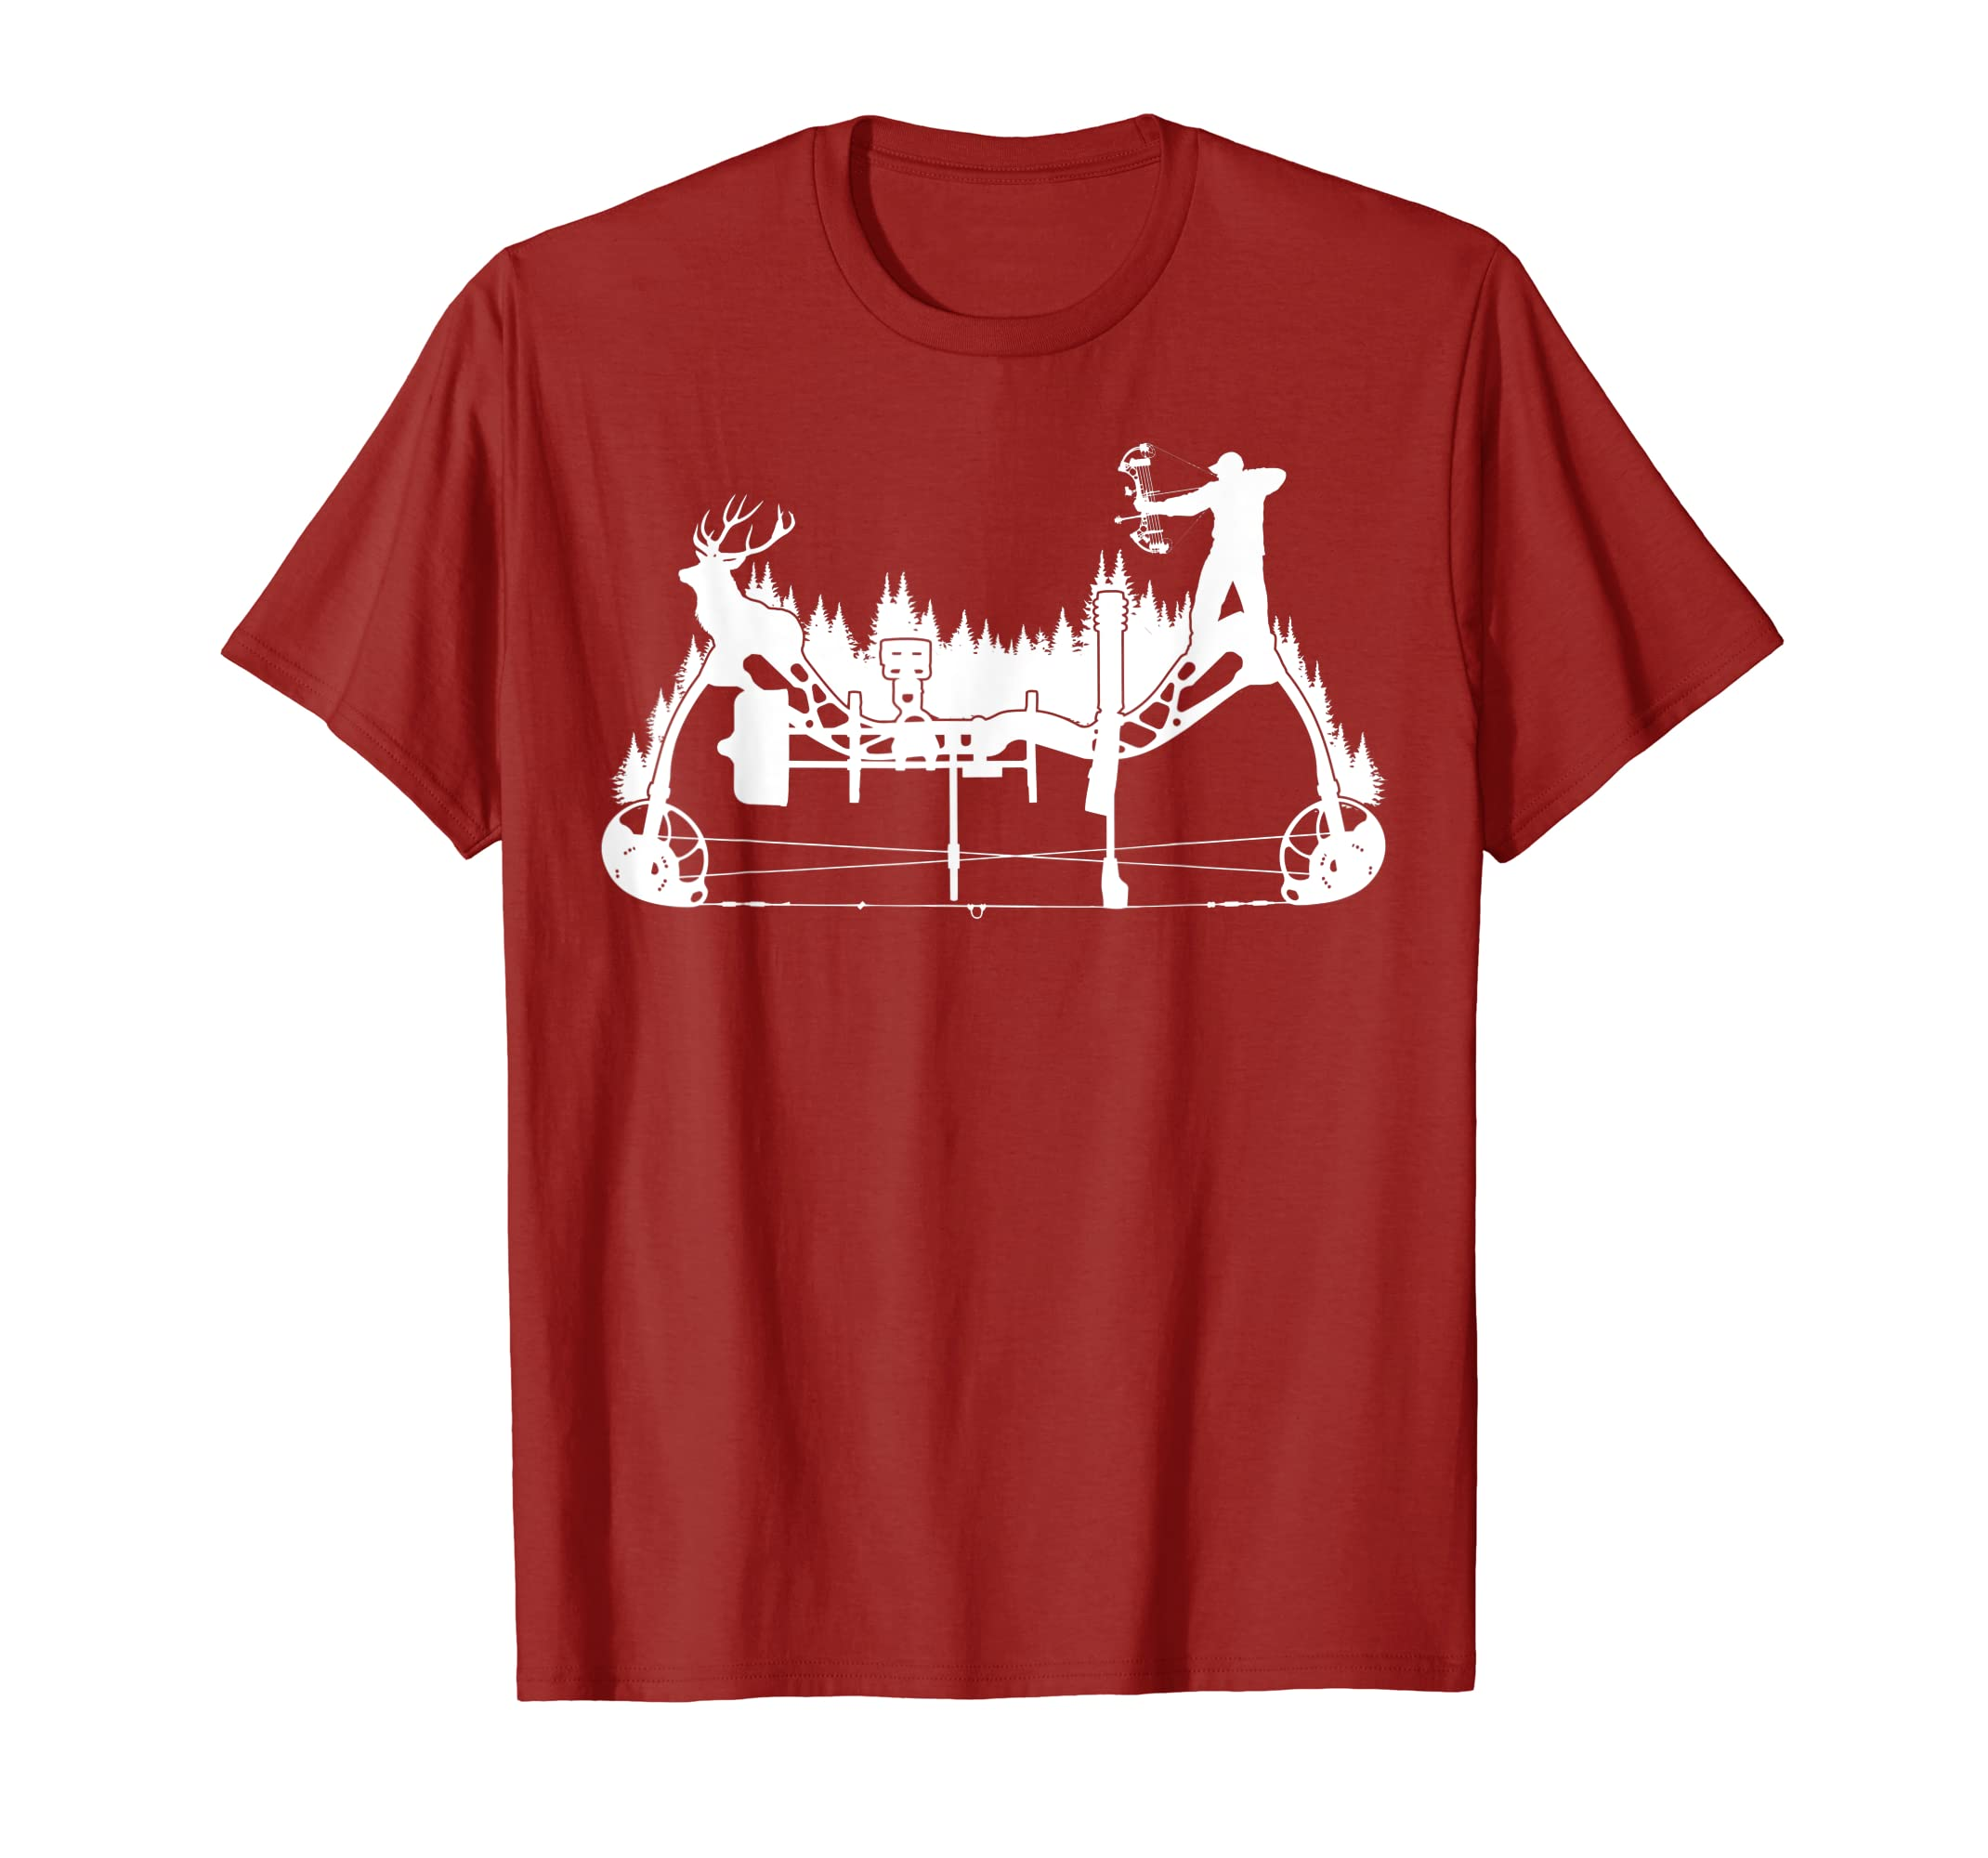 1b463eb175ba2 Amazon.com: Archery Compound Bow Hunting T Shirt: Clothing